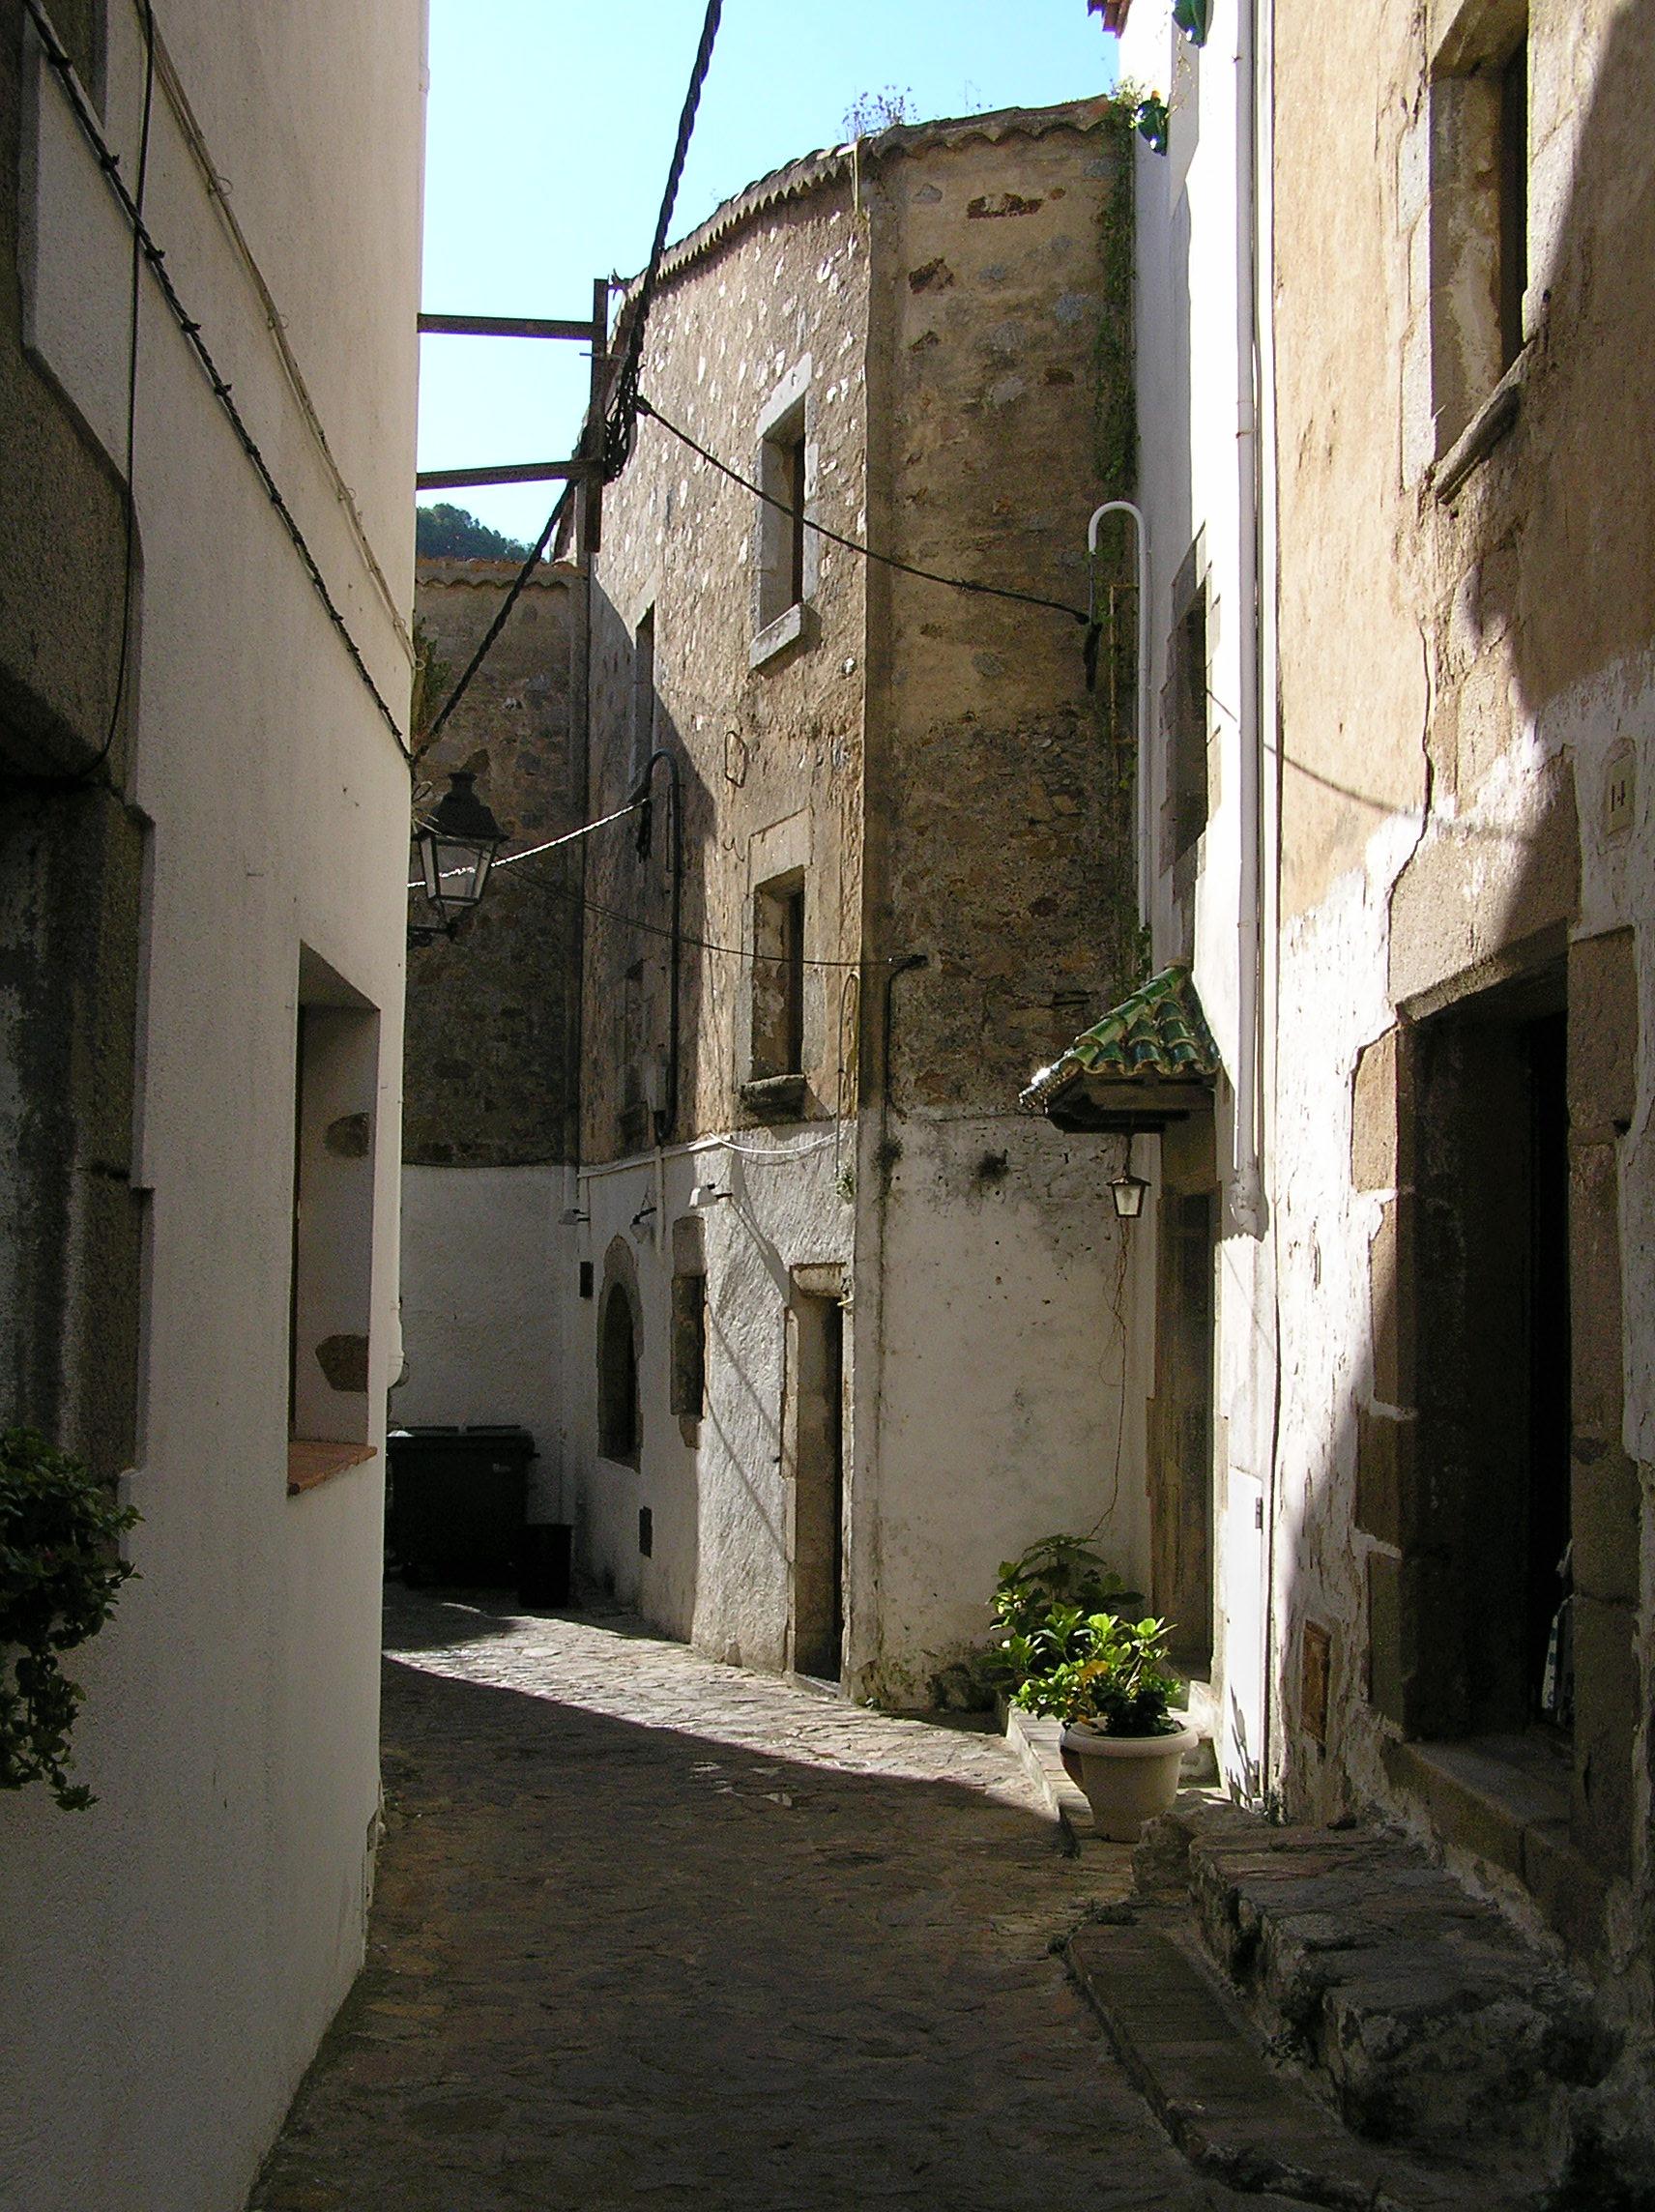 http://upload.wikimedia.org/wikipedia/commons/d/d6/Tossa%2C_carrer_del_Codolar.JPG